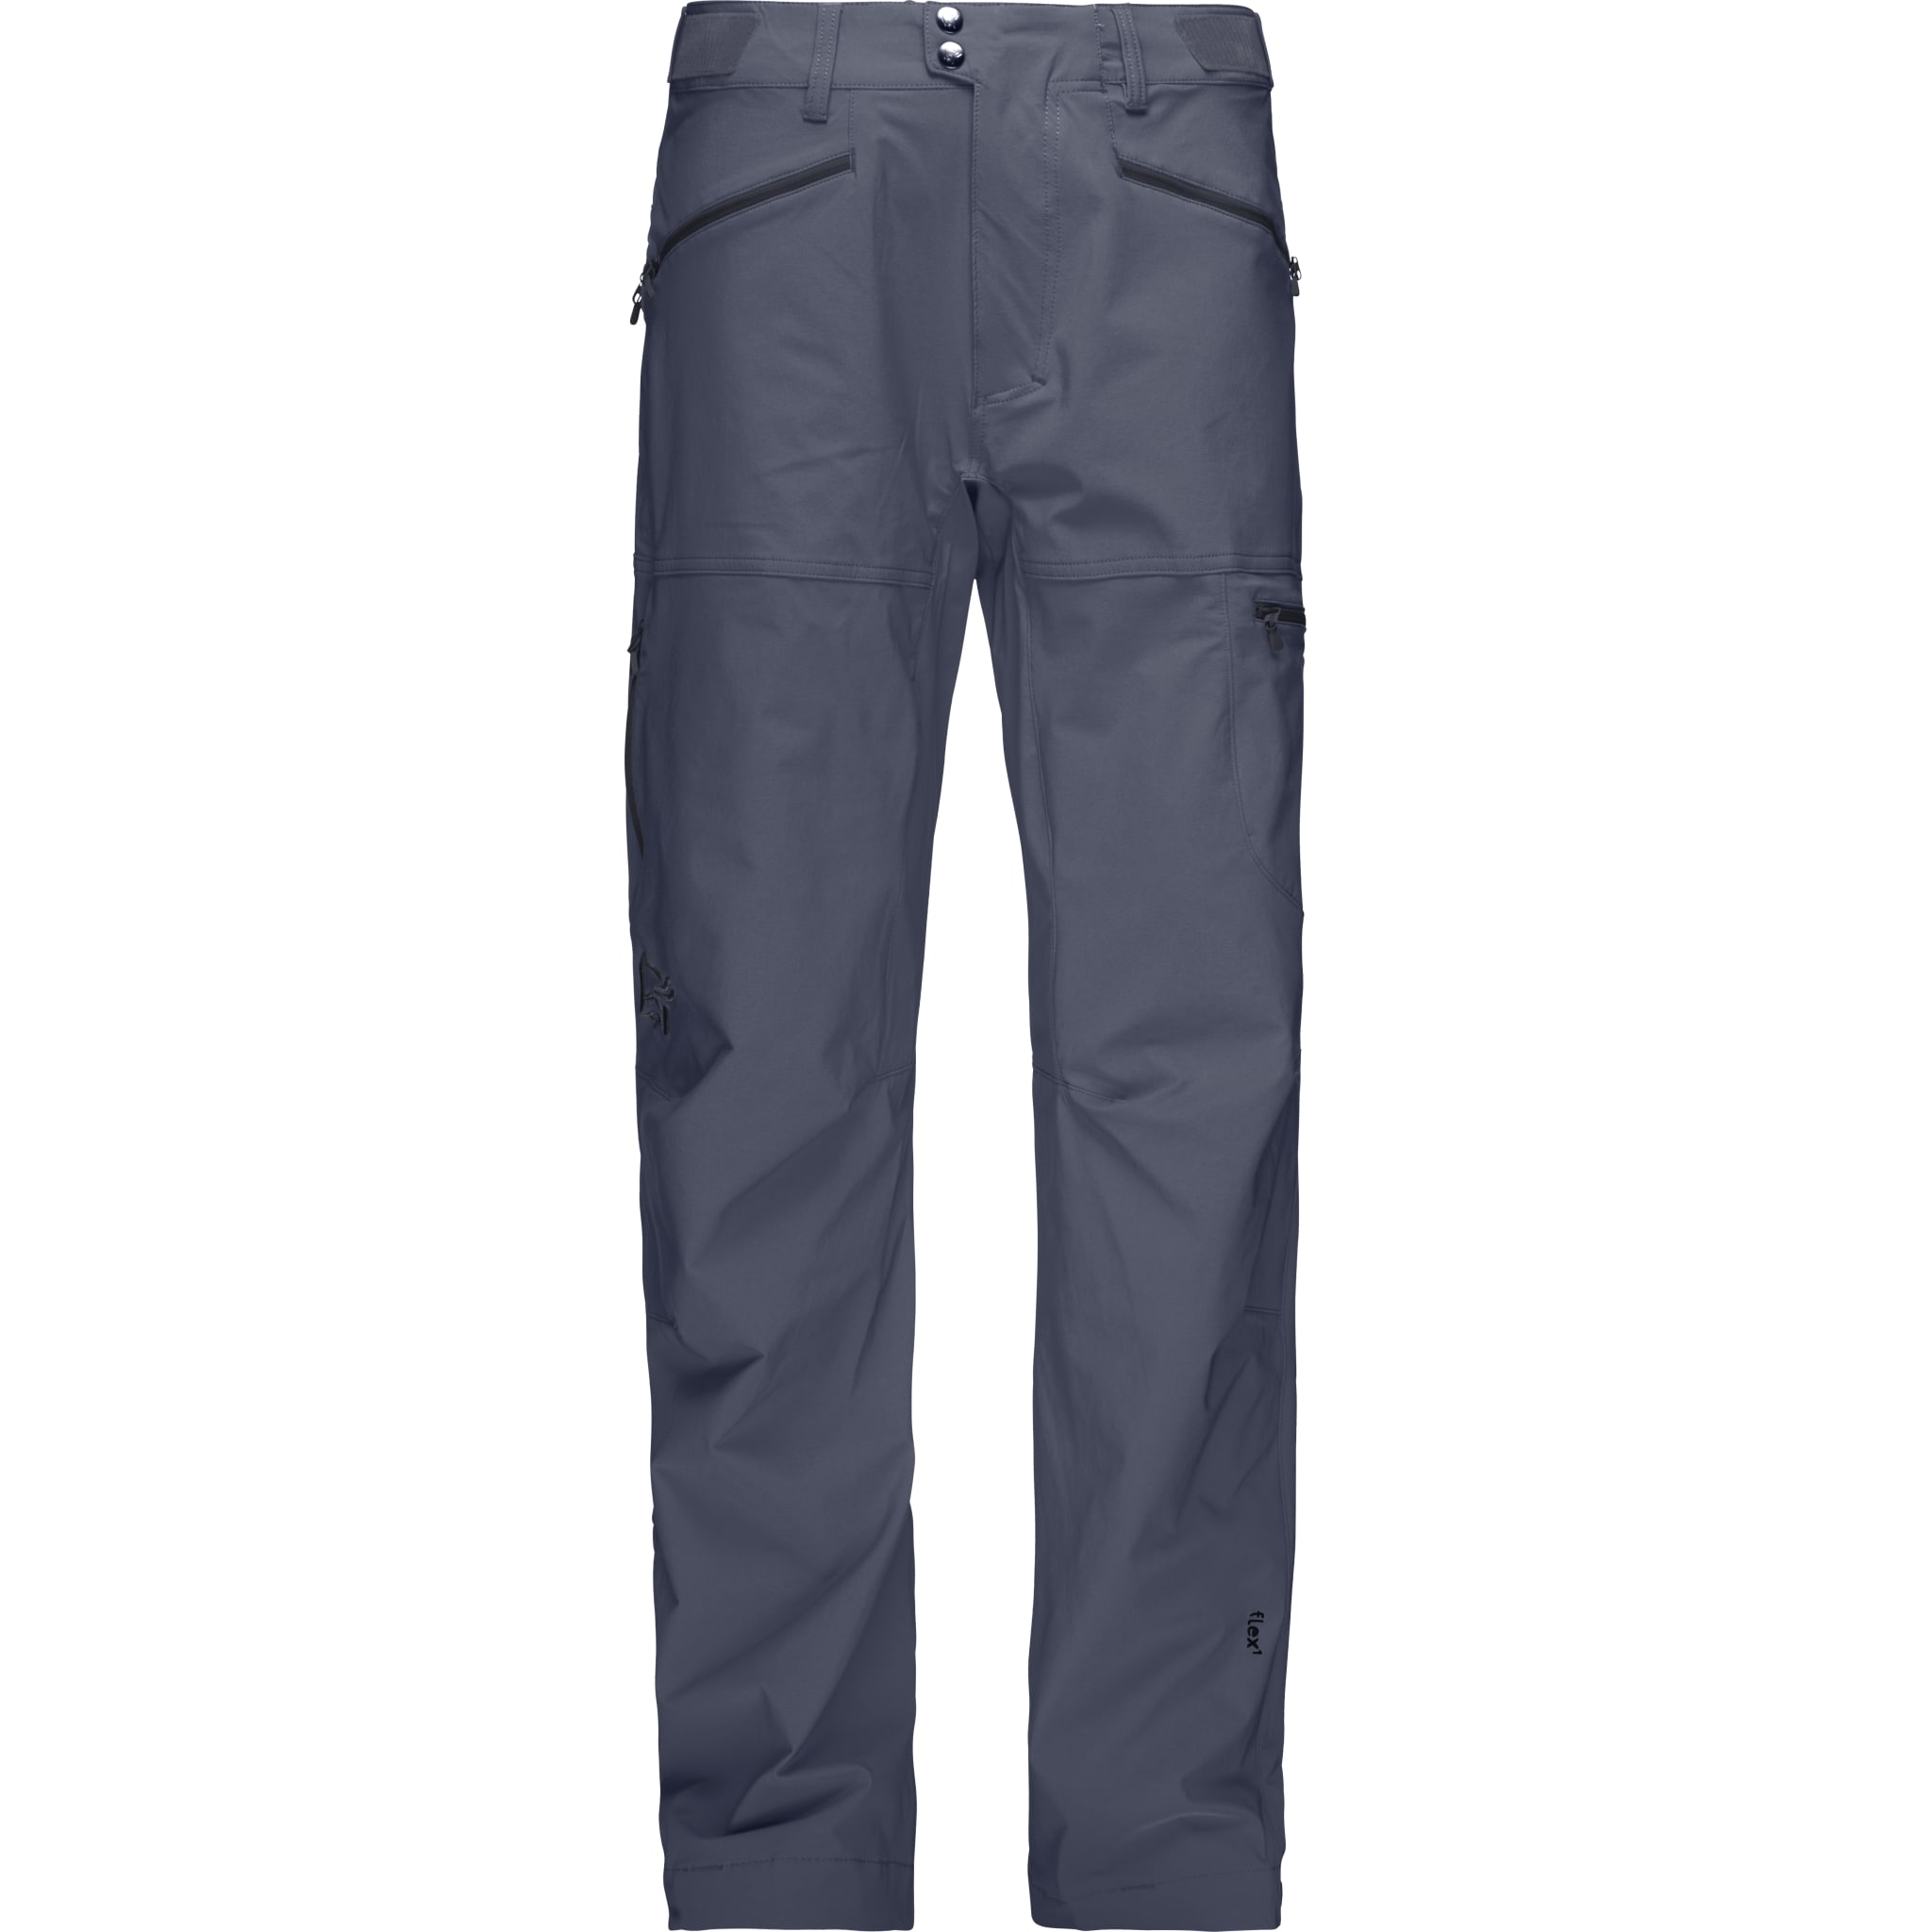 Perfekt all-round-bukse for den aktive friluftsentusiasten